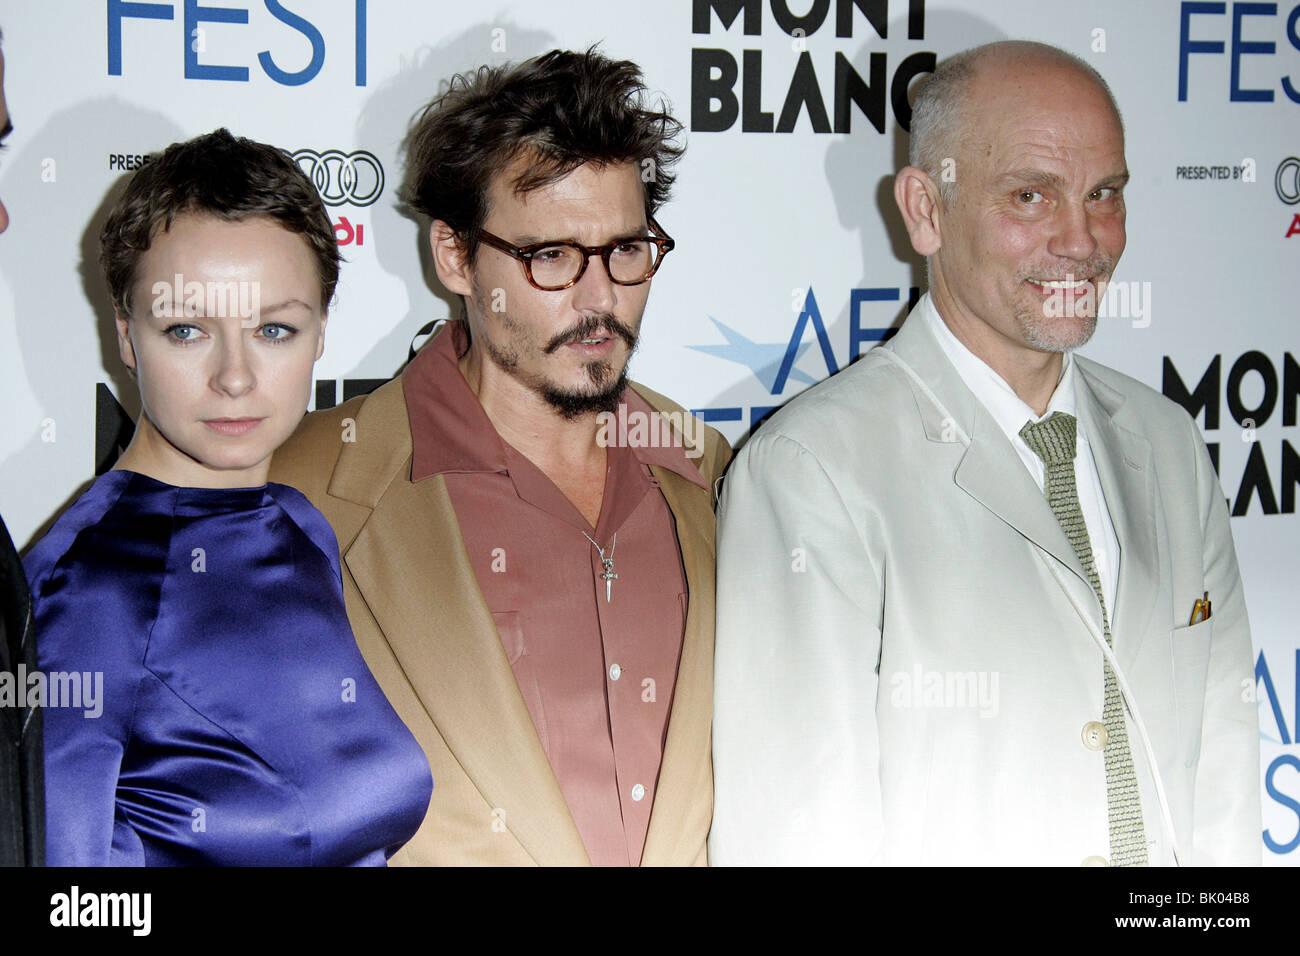 SAMANTHA MORTON JOHNNY DEPP & JOHN MALKOVICH THE LIBERTINE PREMIER AFI FEST 2005 ARCLIGHT HOLLYWOOD LOS ANGELES - Stock Image